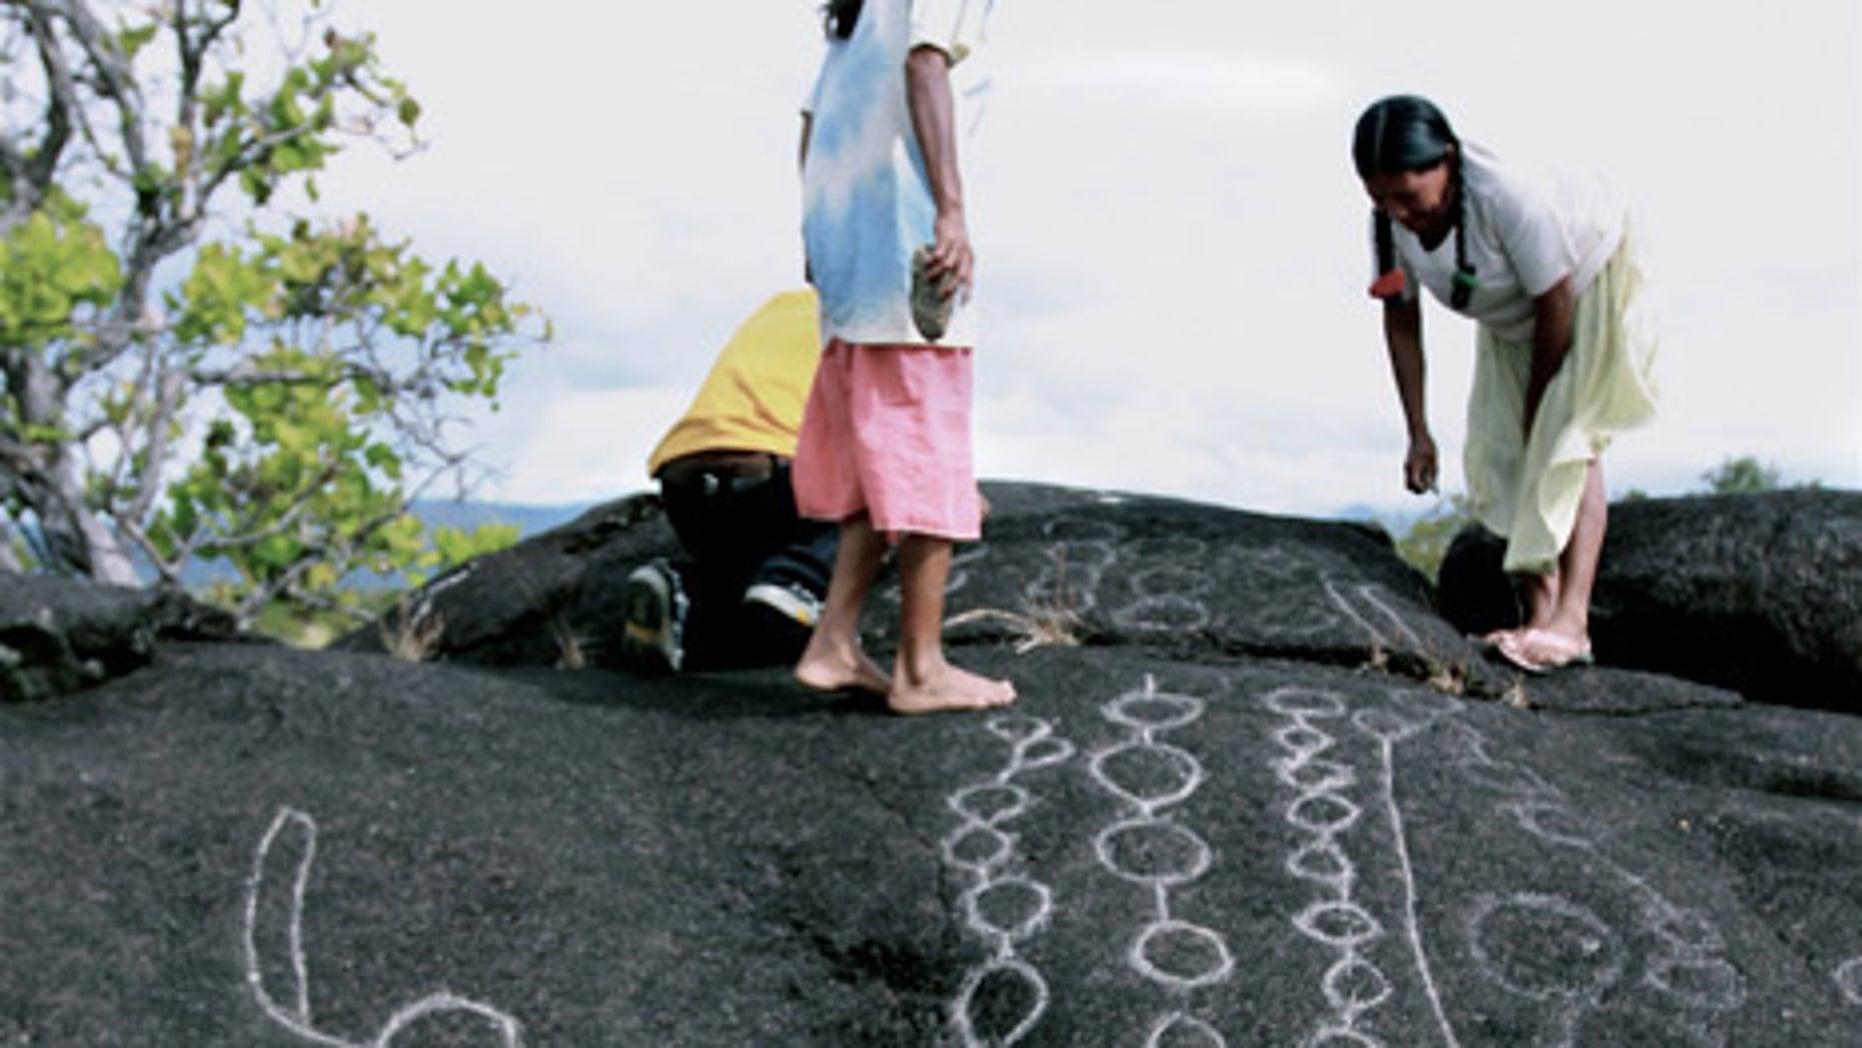 Two Wapishana women maintain traditional rock carvings at a spiritual site.